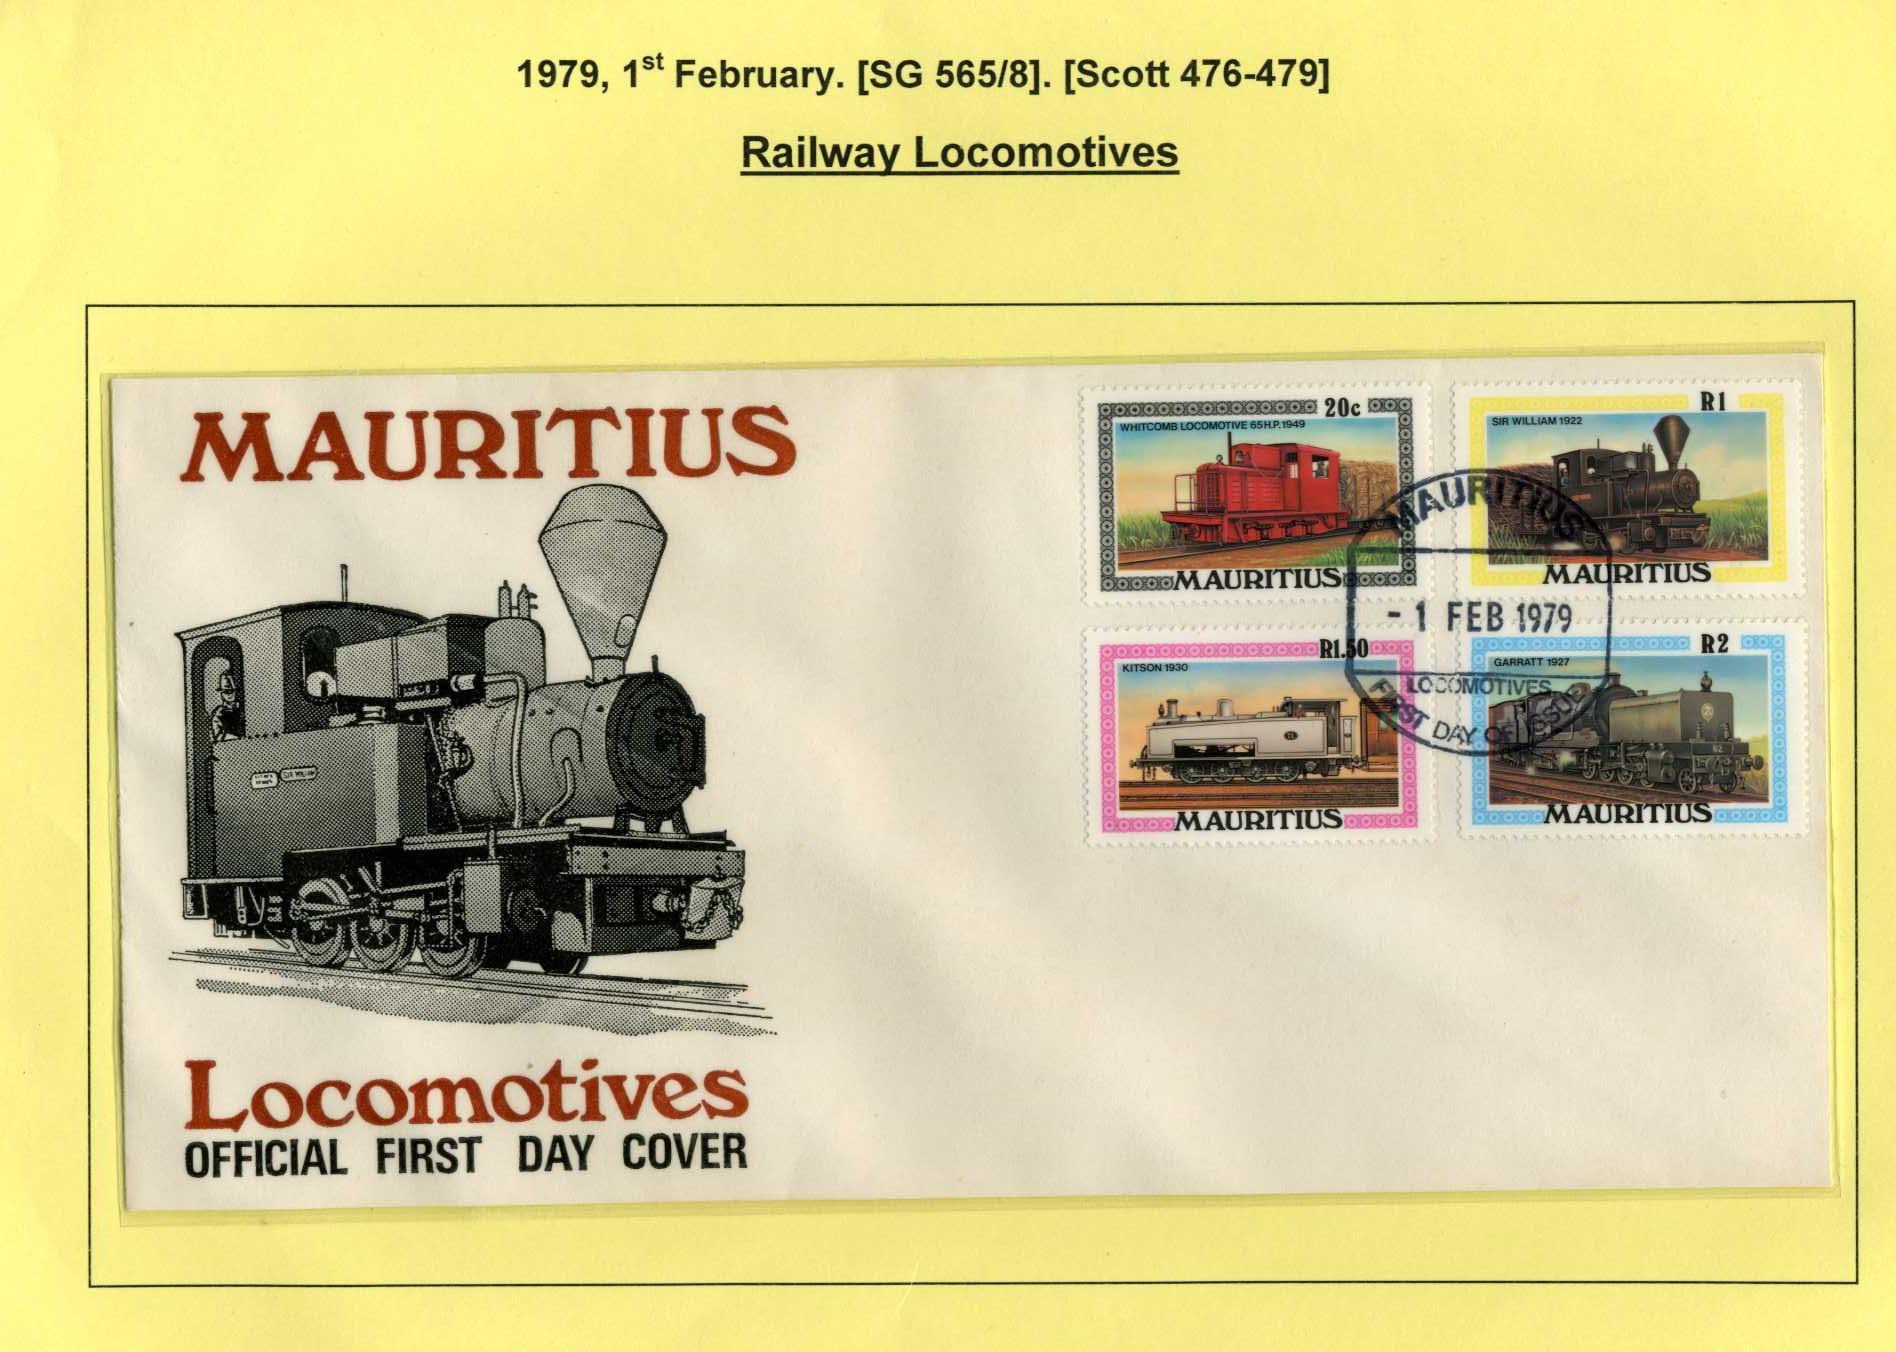 Mauritius Railway Locomotives